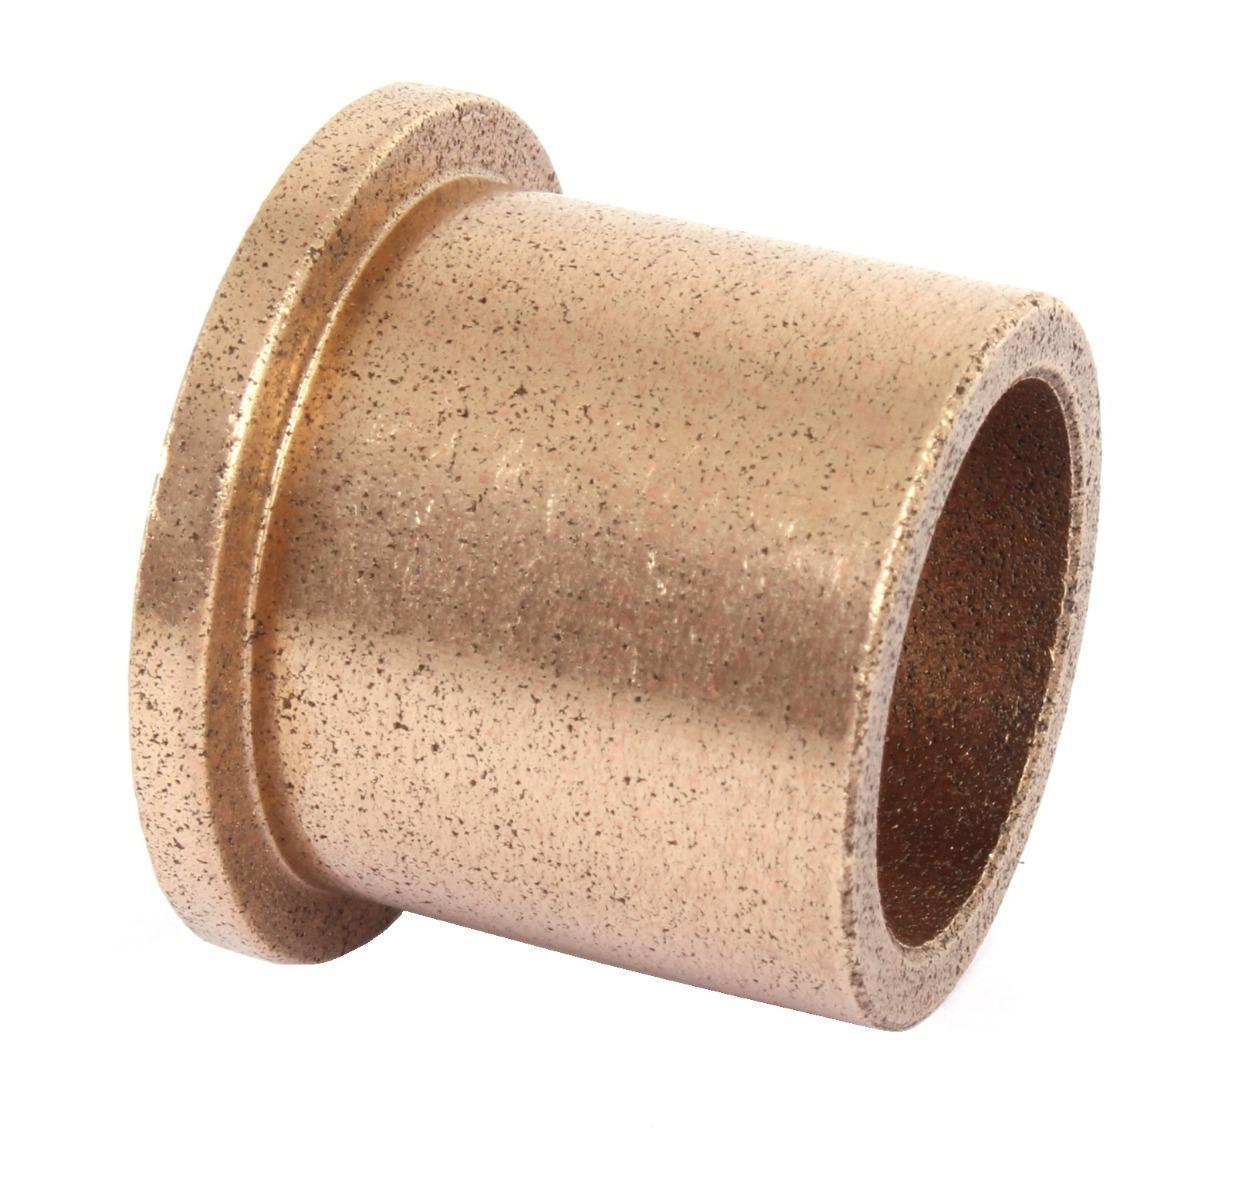 Oilite Bronze Bush Flanged 10mm bore x 13mm OD x 20mm long 17 x 2.5 flange